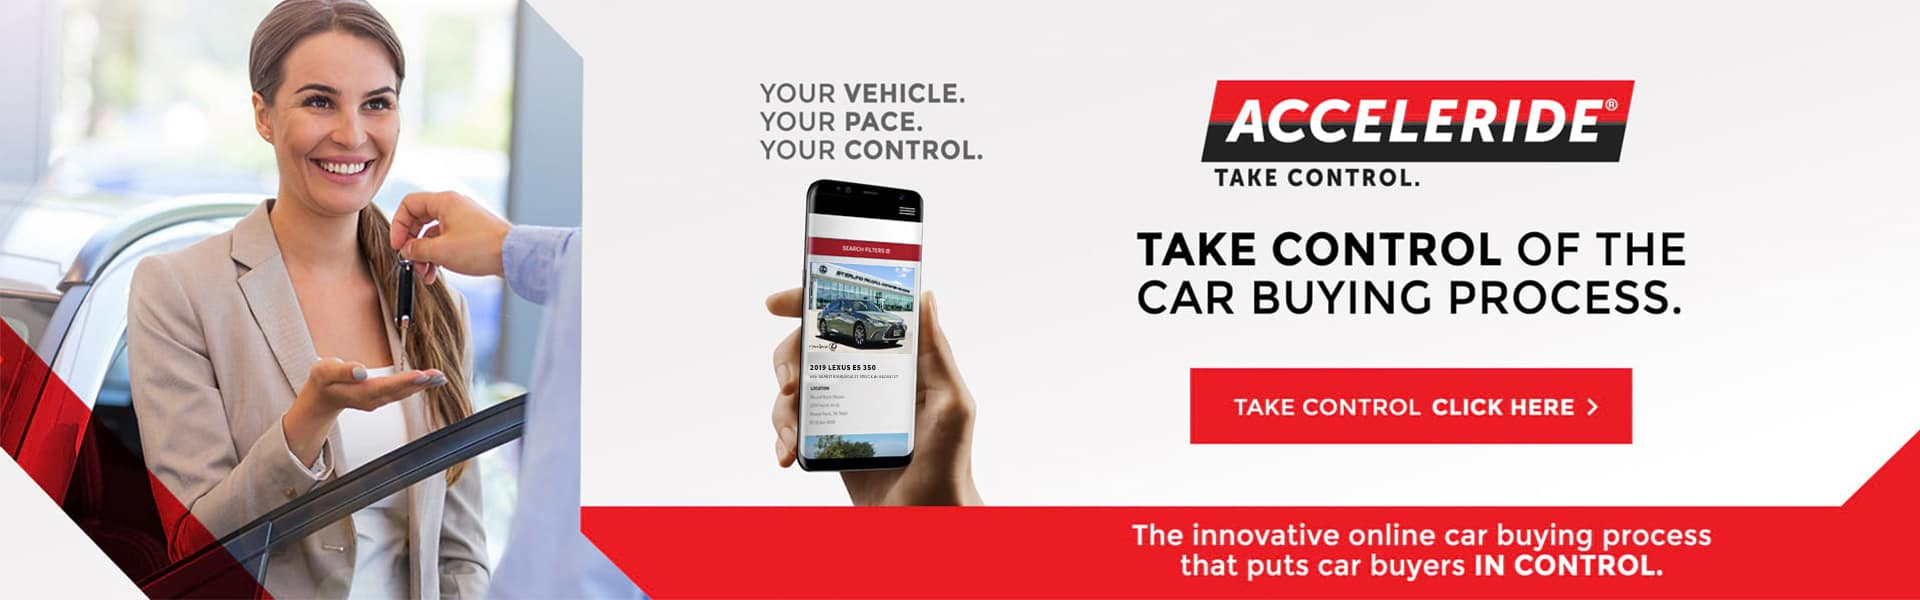 Lexus-Acceleride-Homepage-Banner